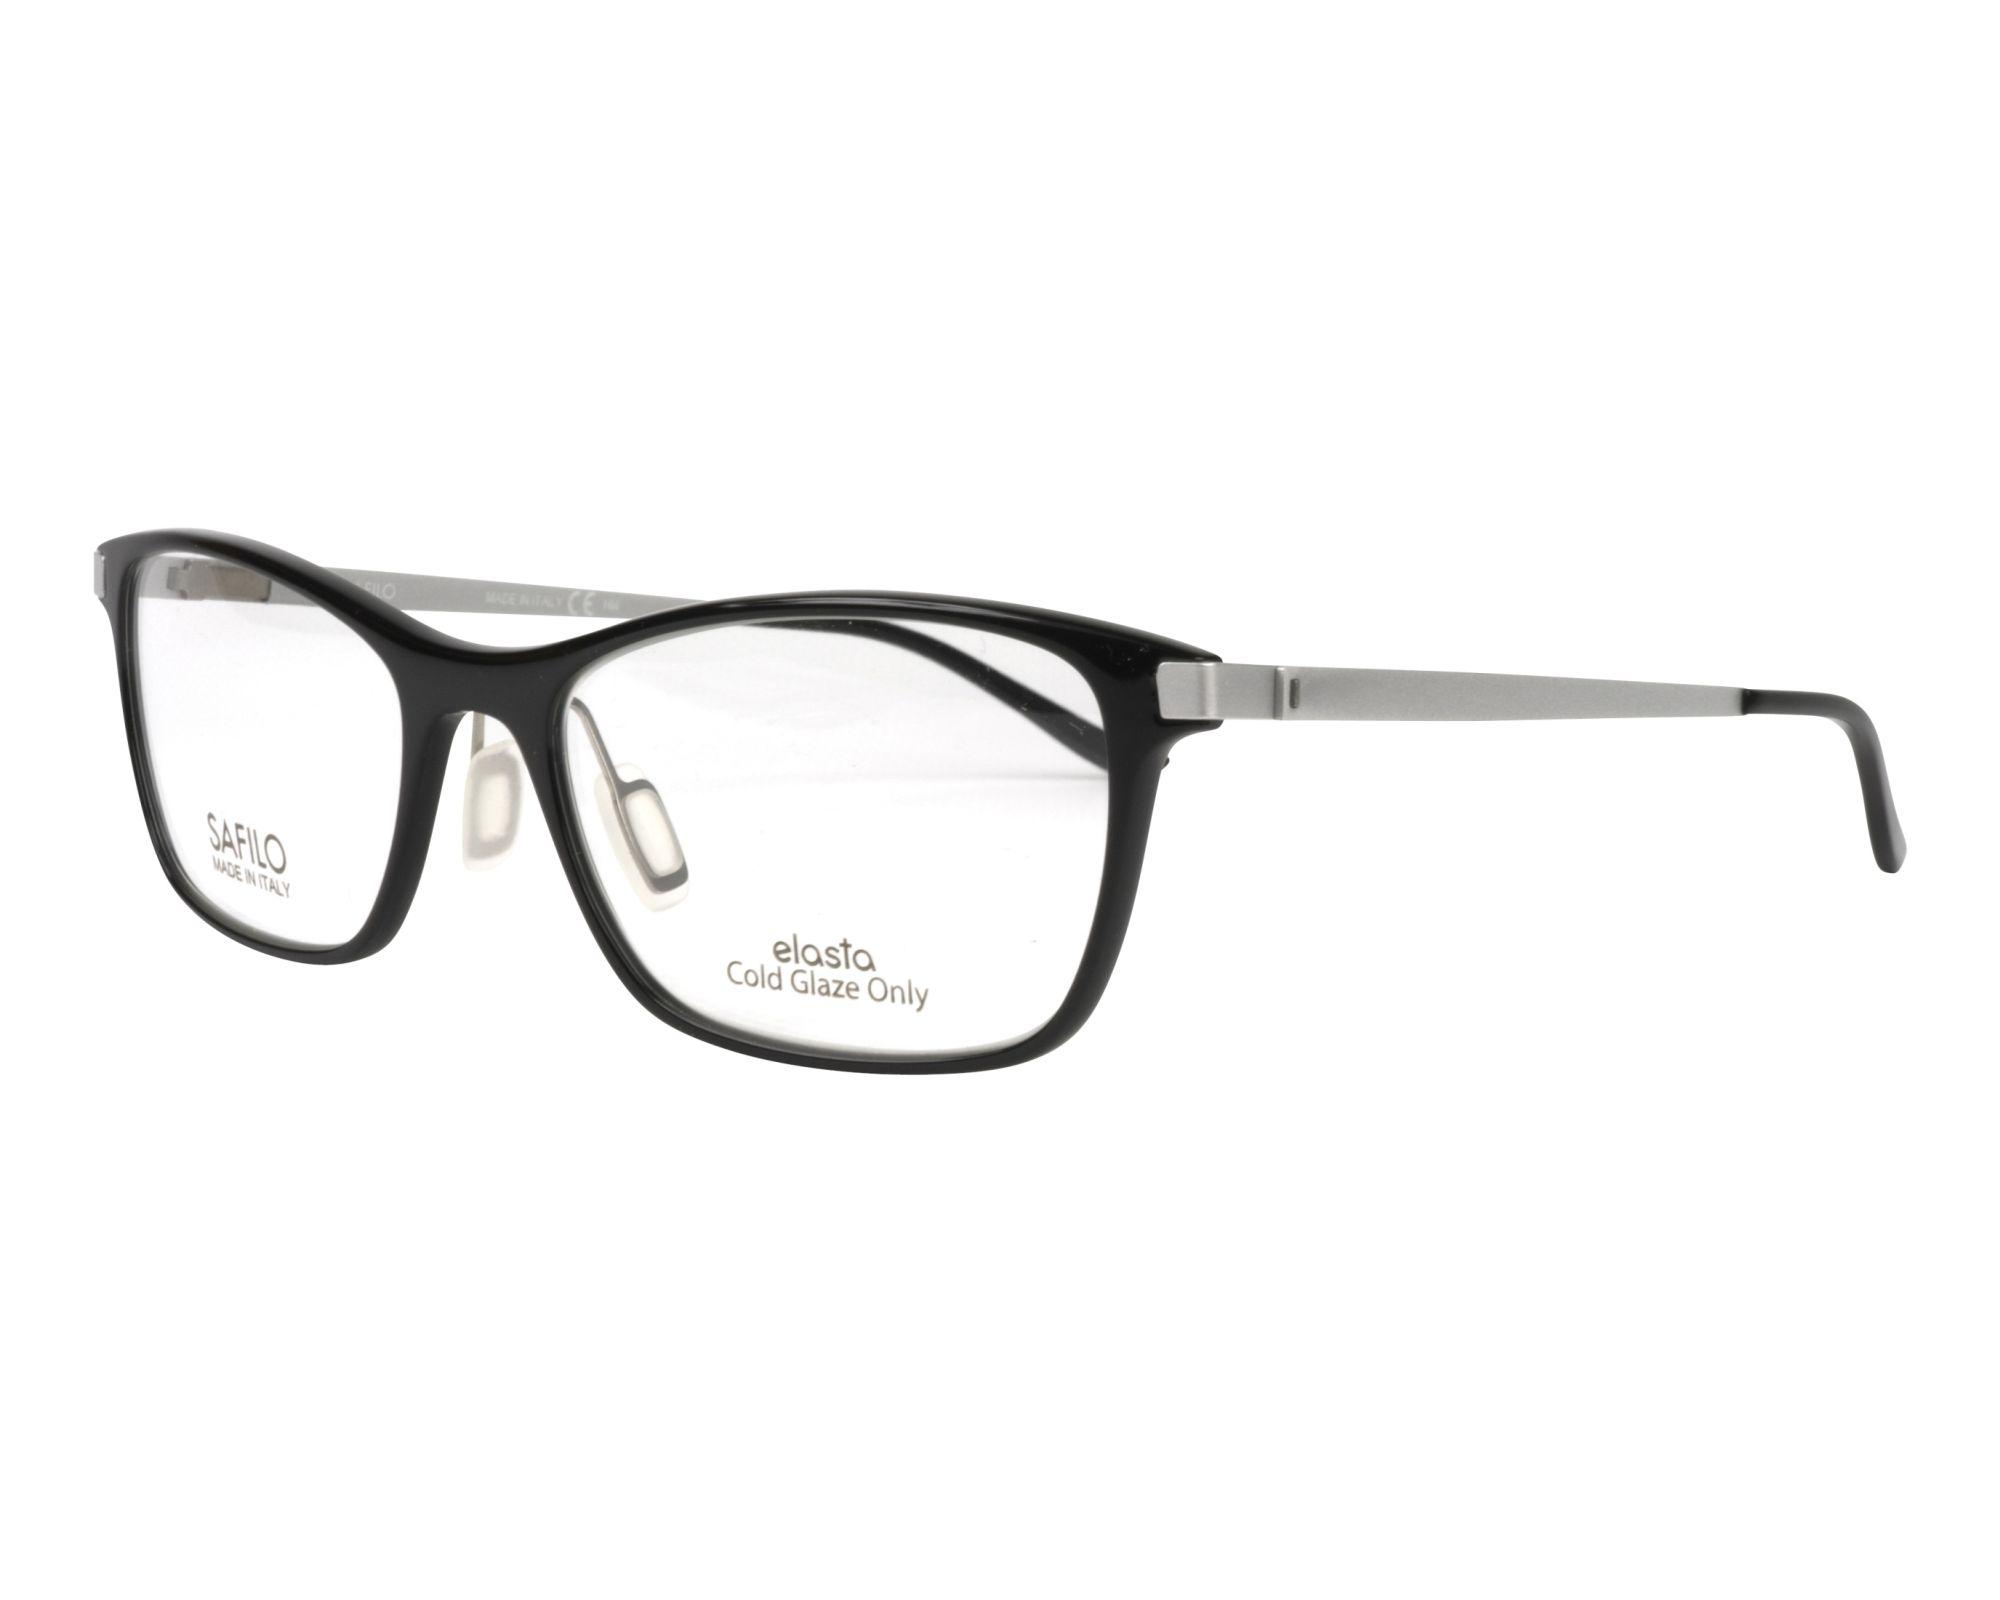 Safilo Eyeglasses Black SA-6052 F3H - Visionet US